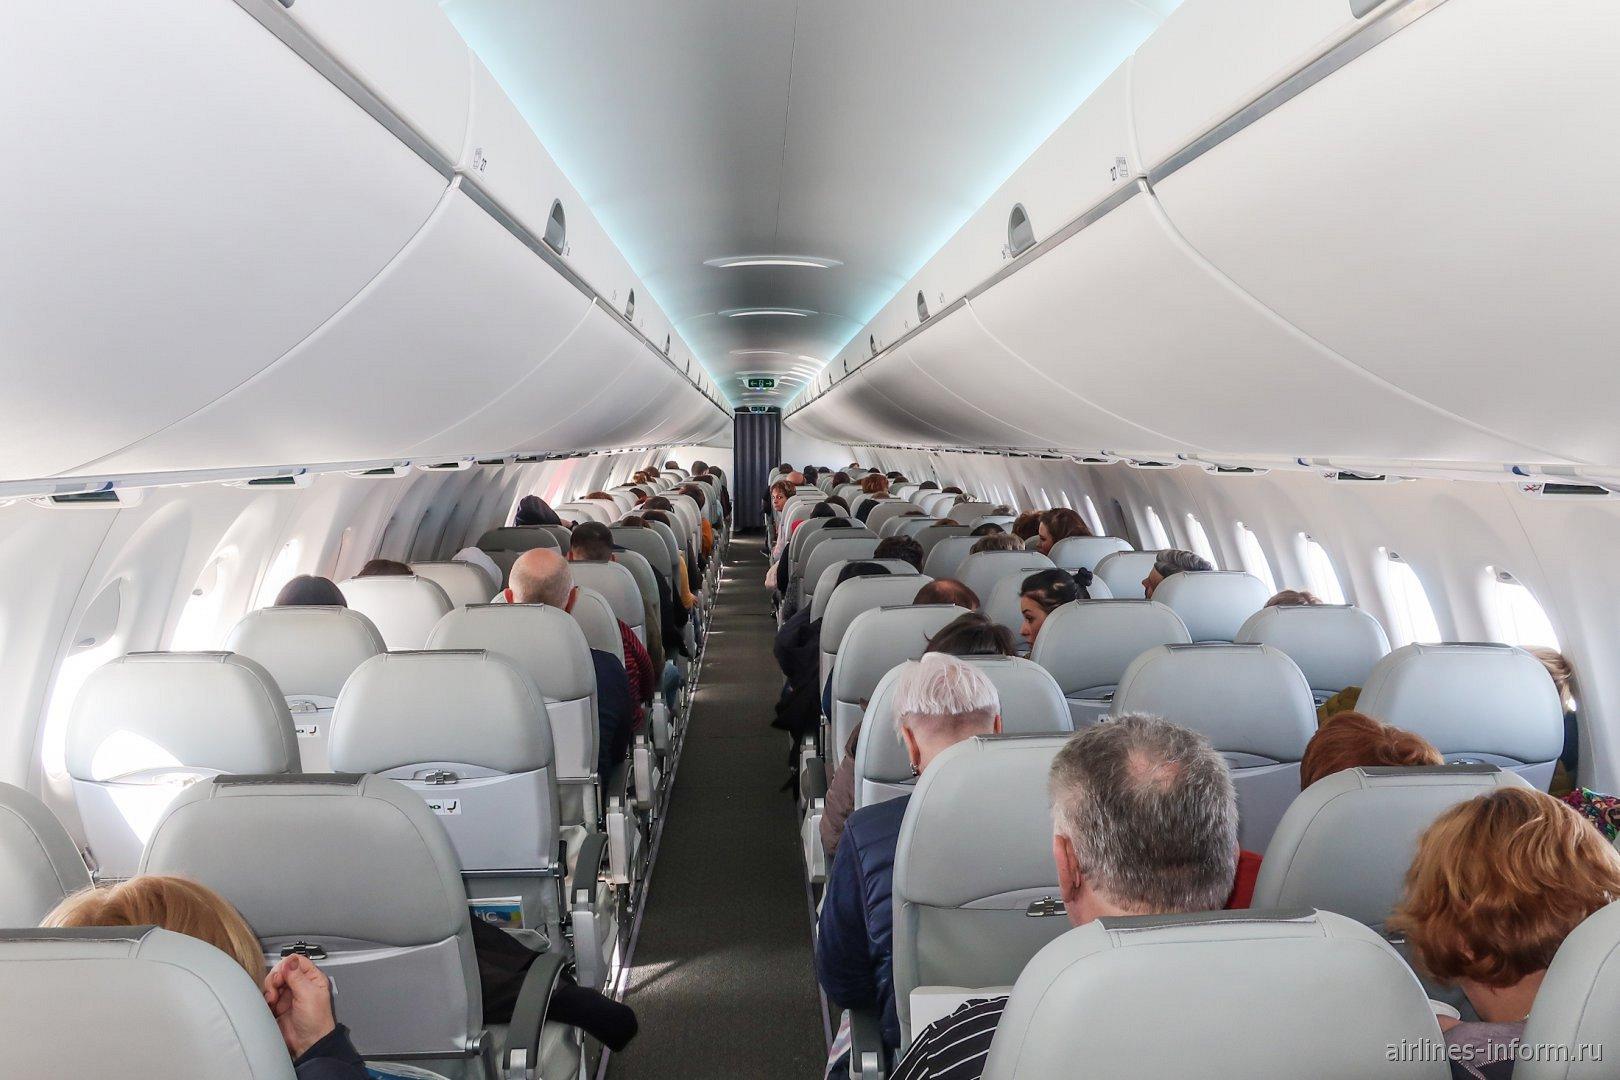 Вид сзади на пассажирский салон в самолете Airbus A220-300 авиакомпании airBaltic